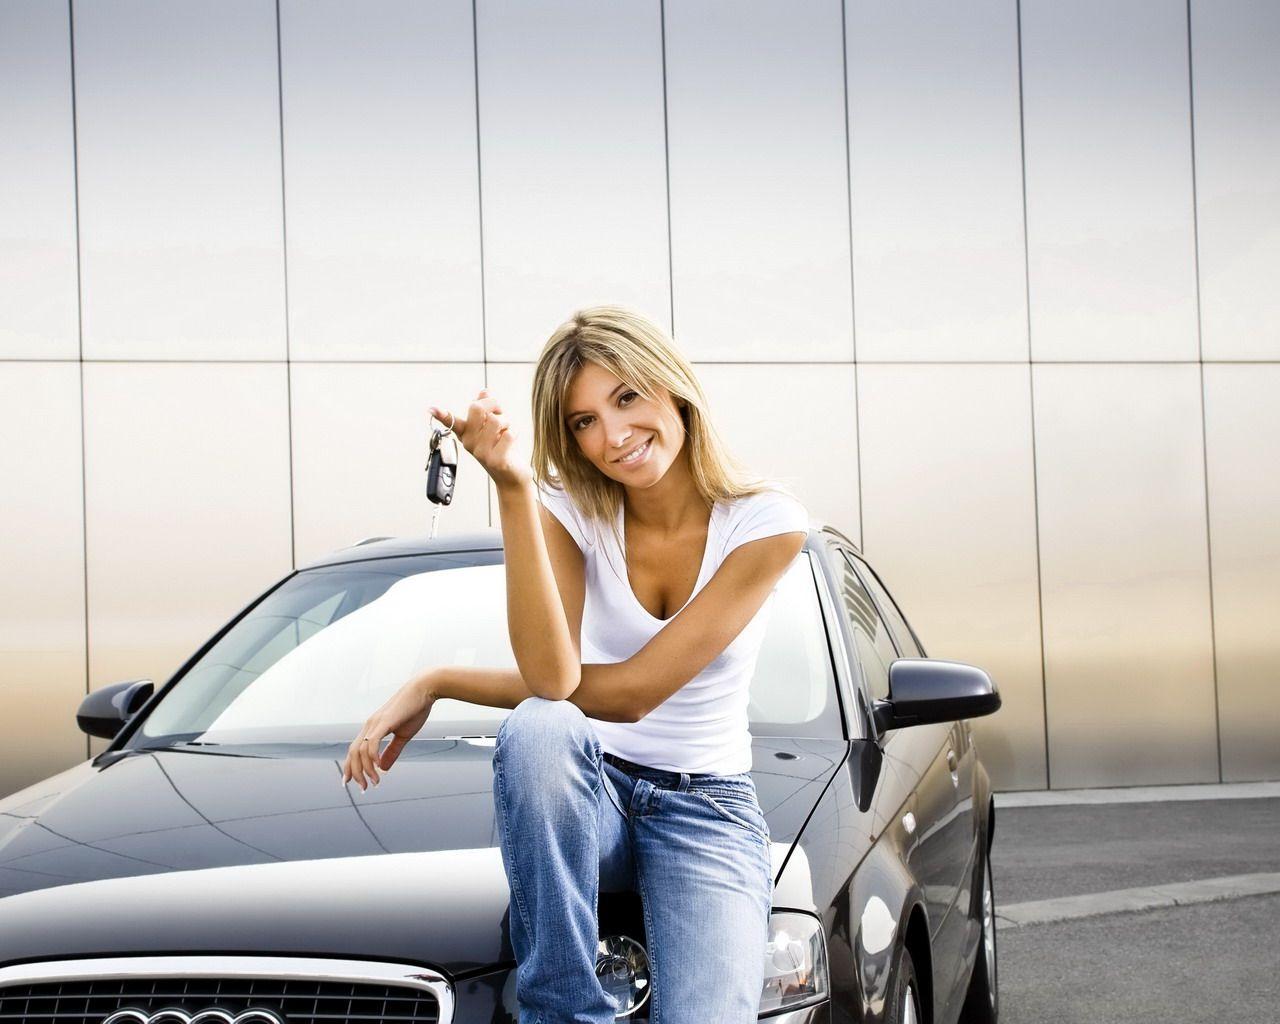 Car Insurance Kansas City Ks, Buy Online & Save Up to 30